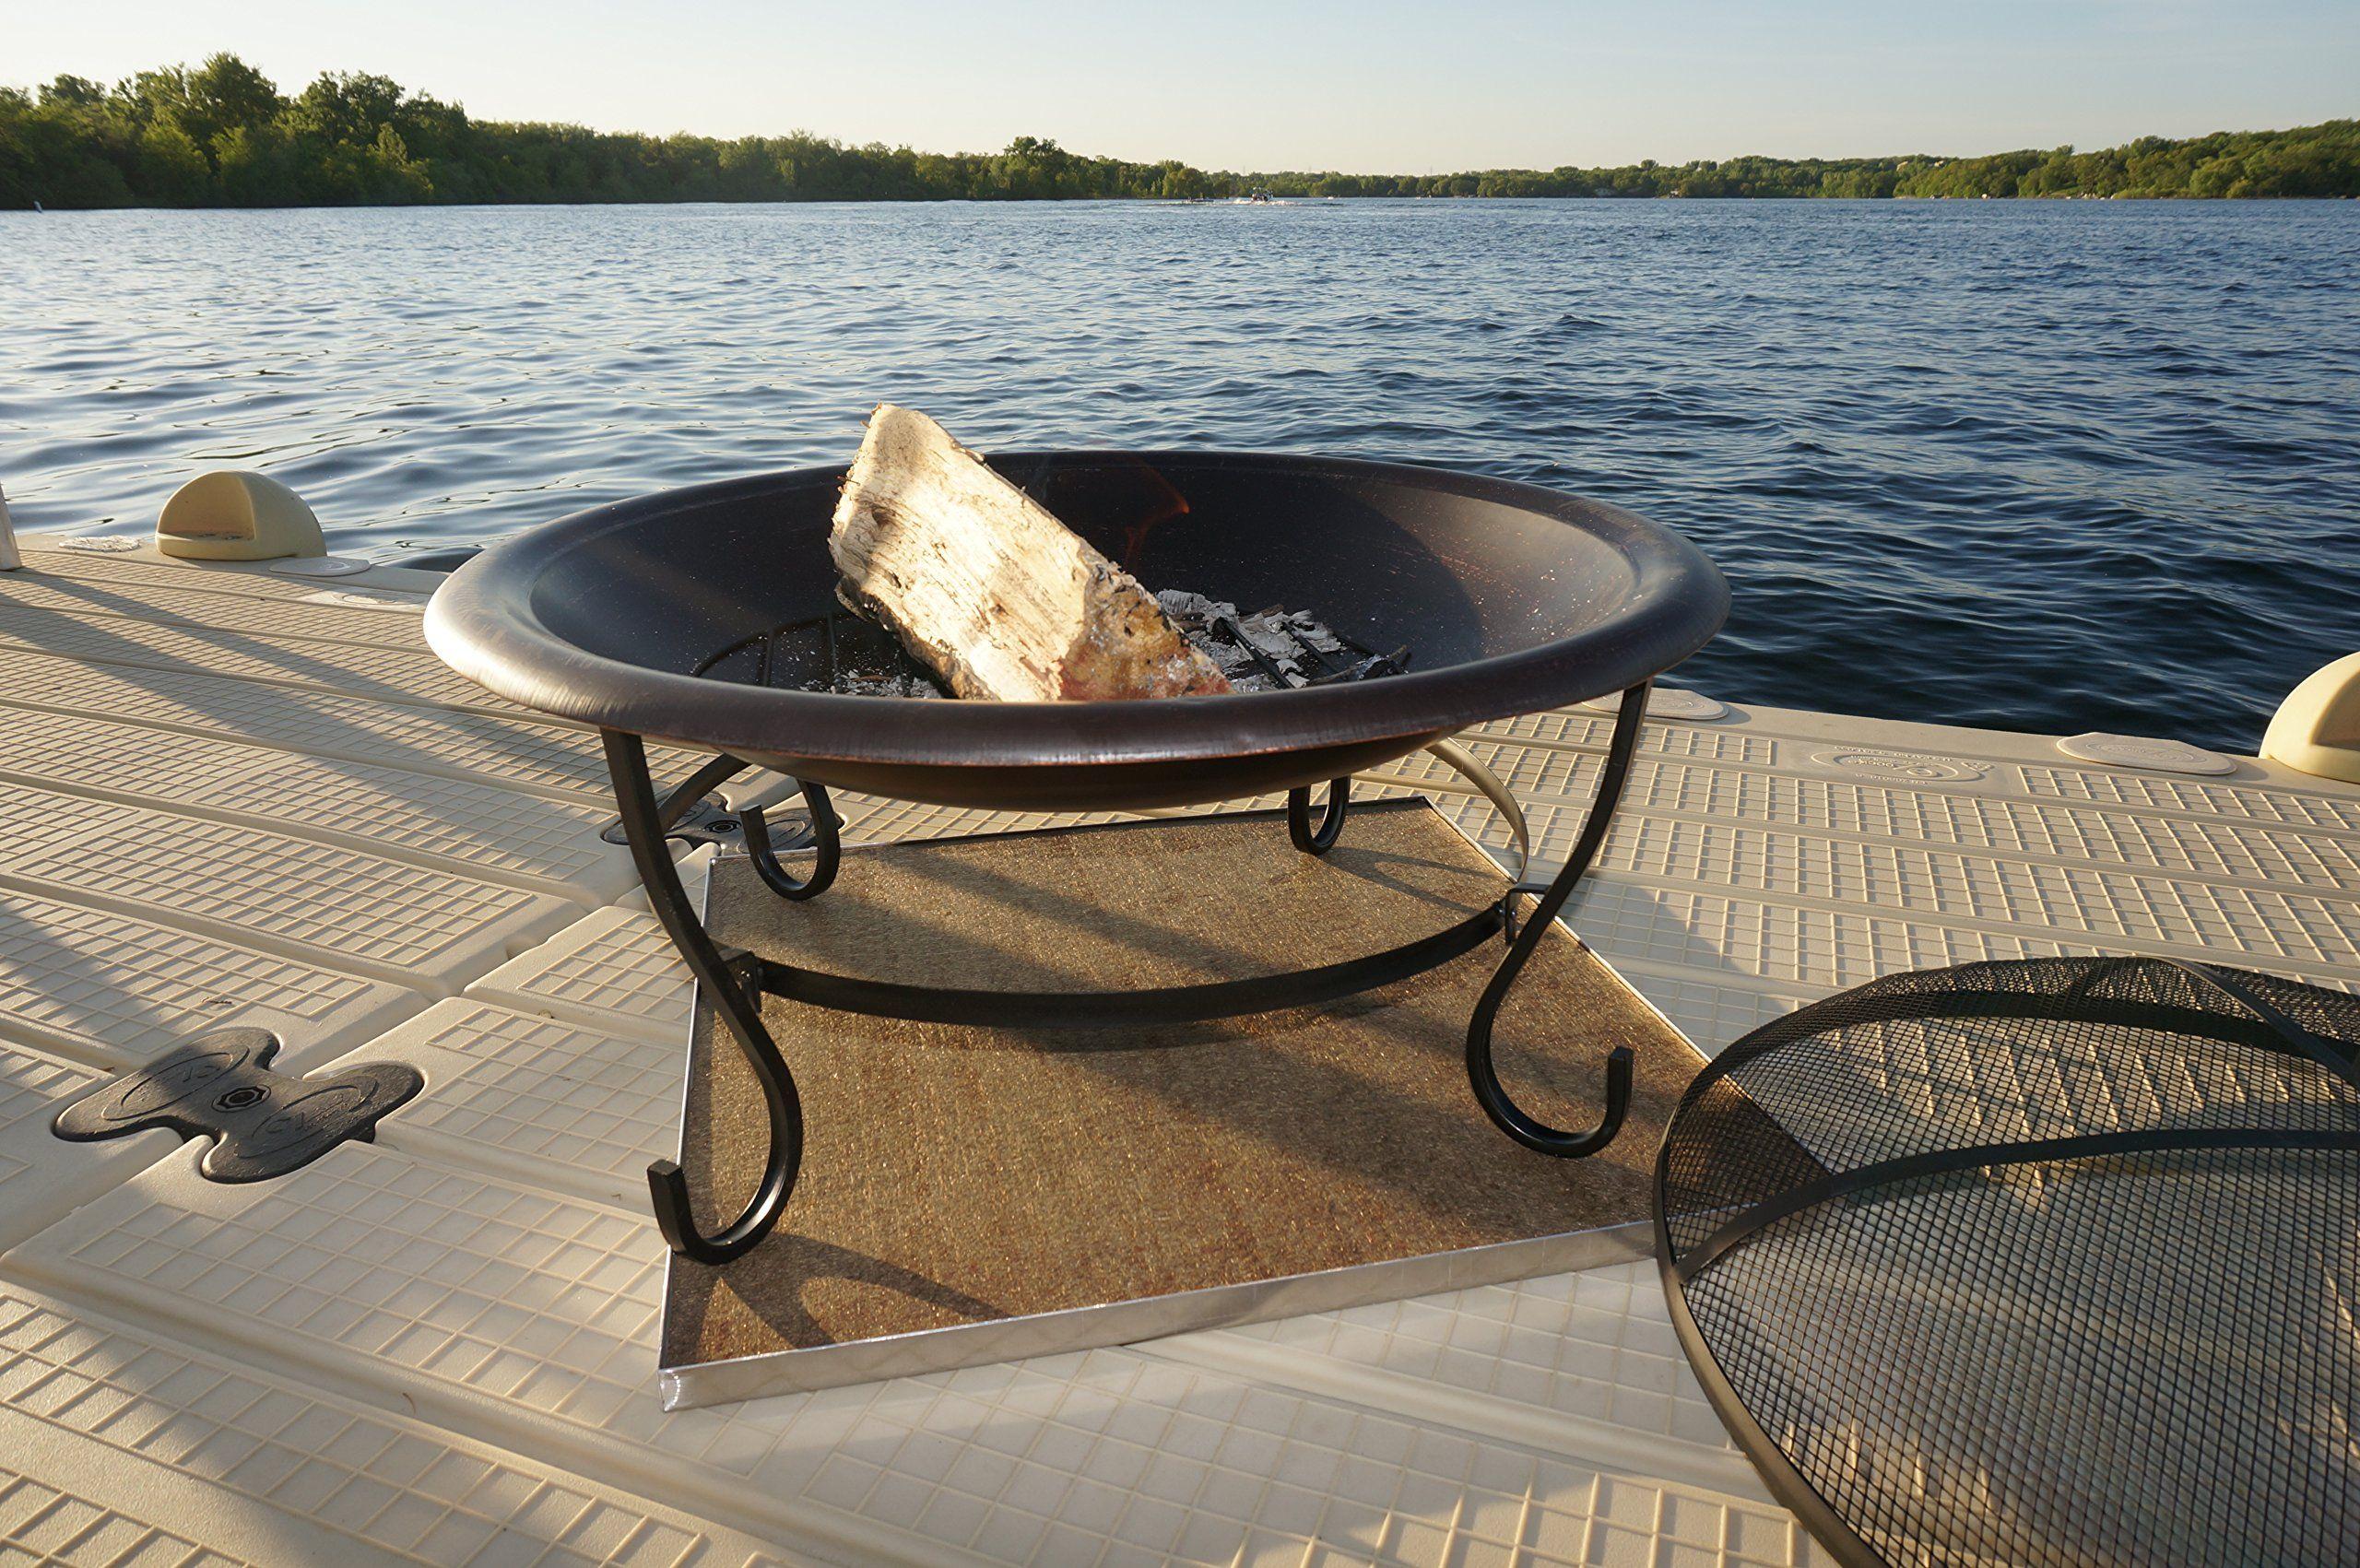 fiberglass home hearth x tan mats round rug half resistant kitchen flame fireproof dp in ca mat amazon